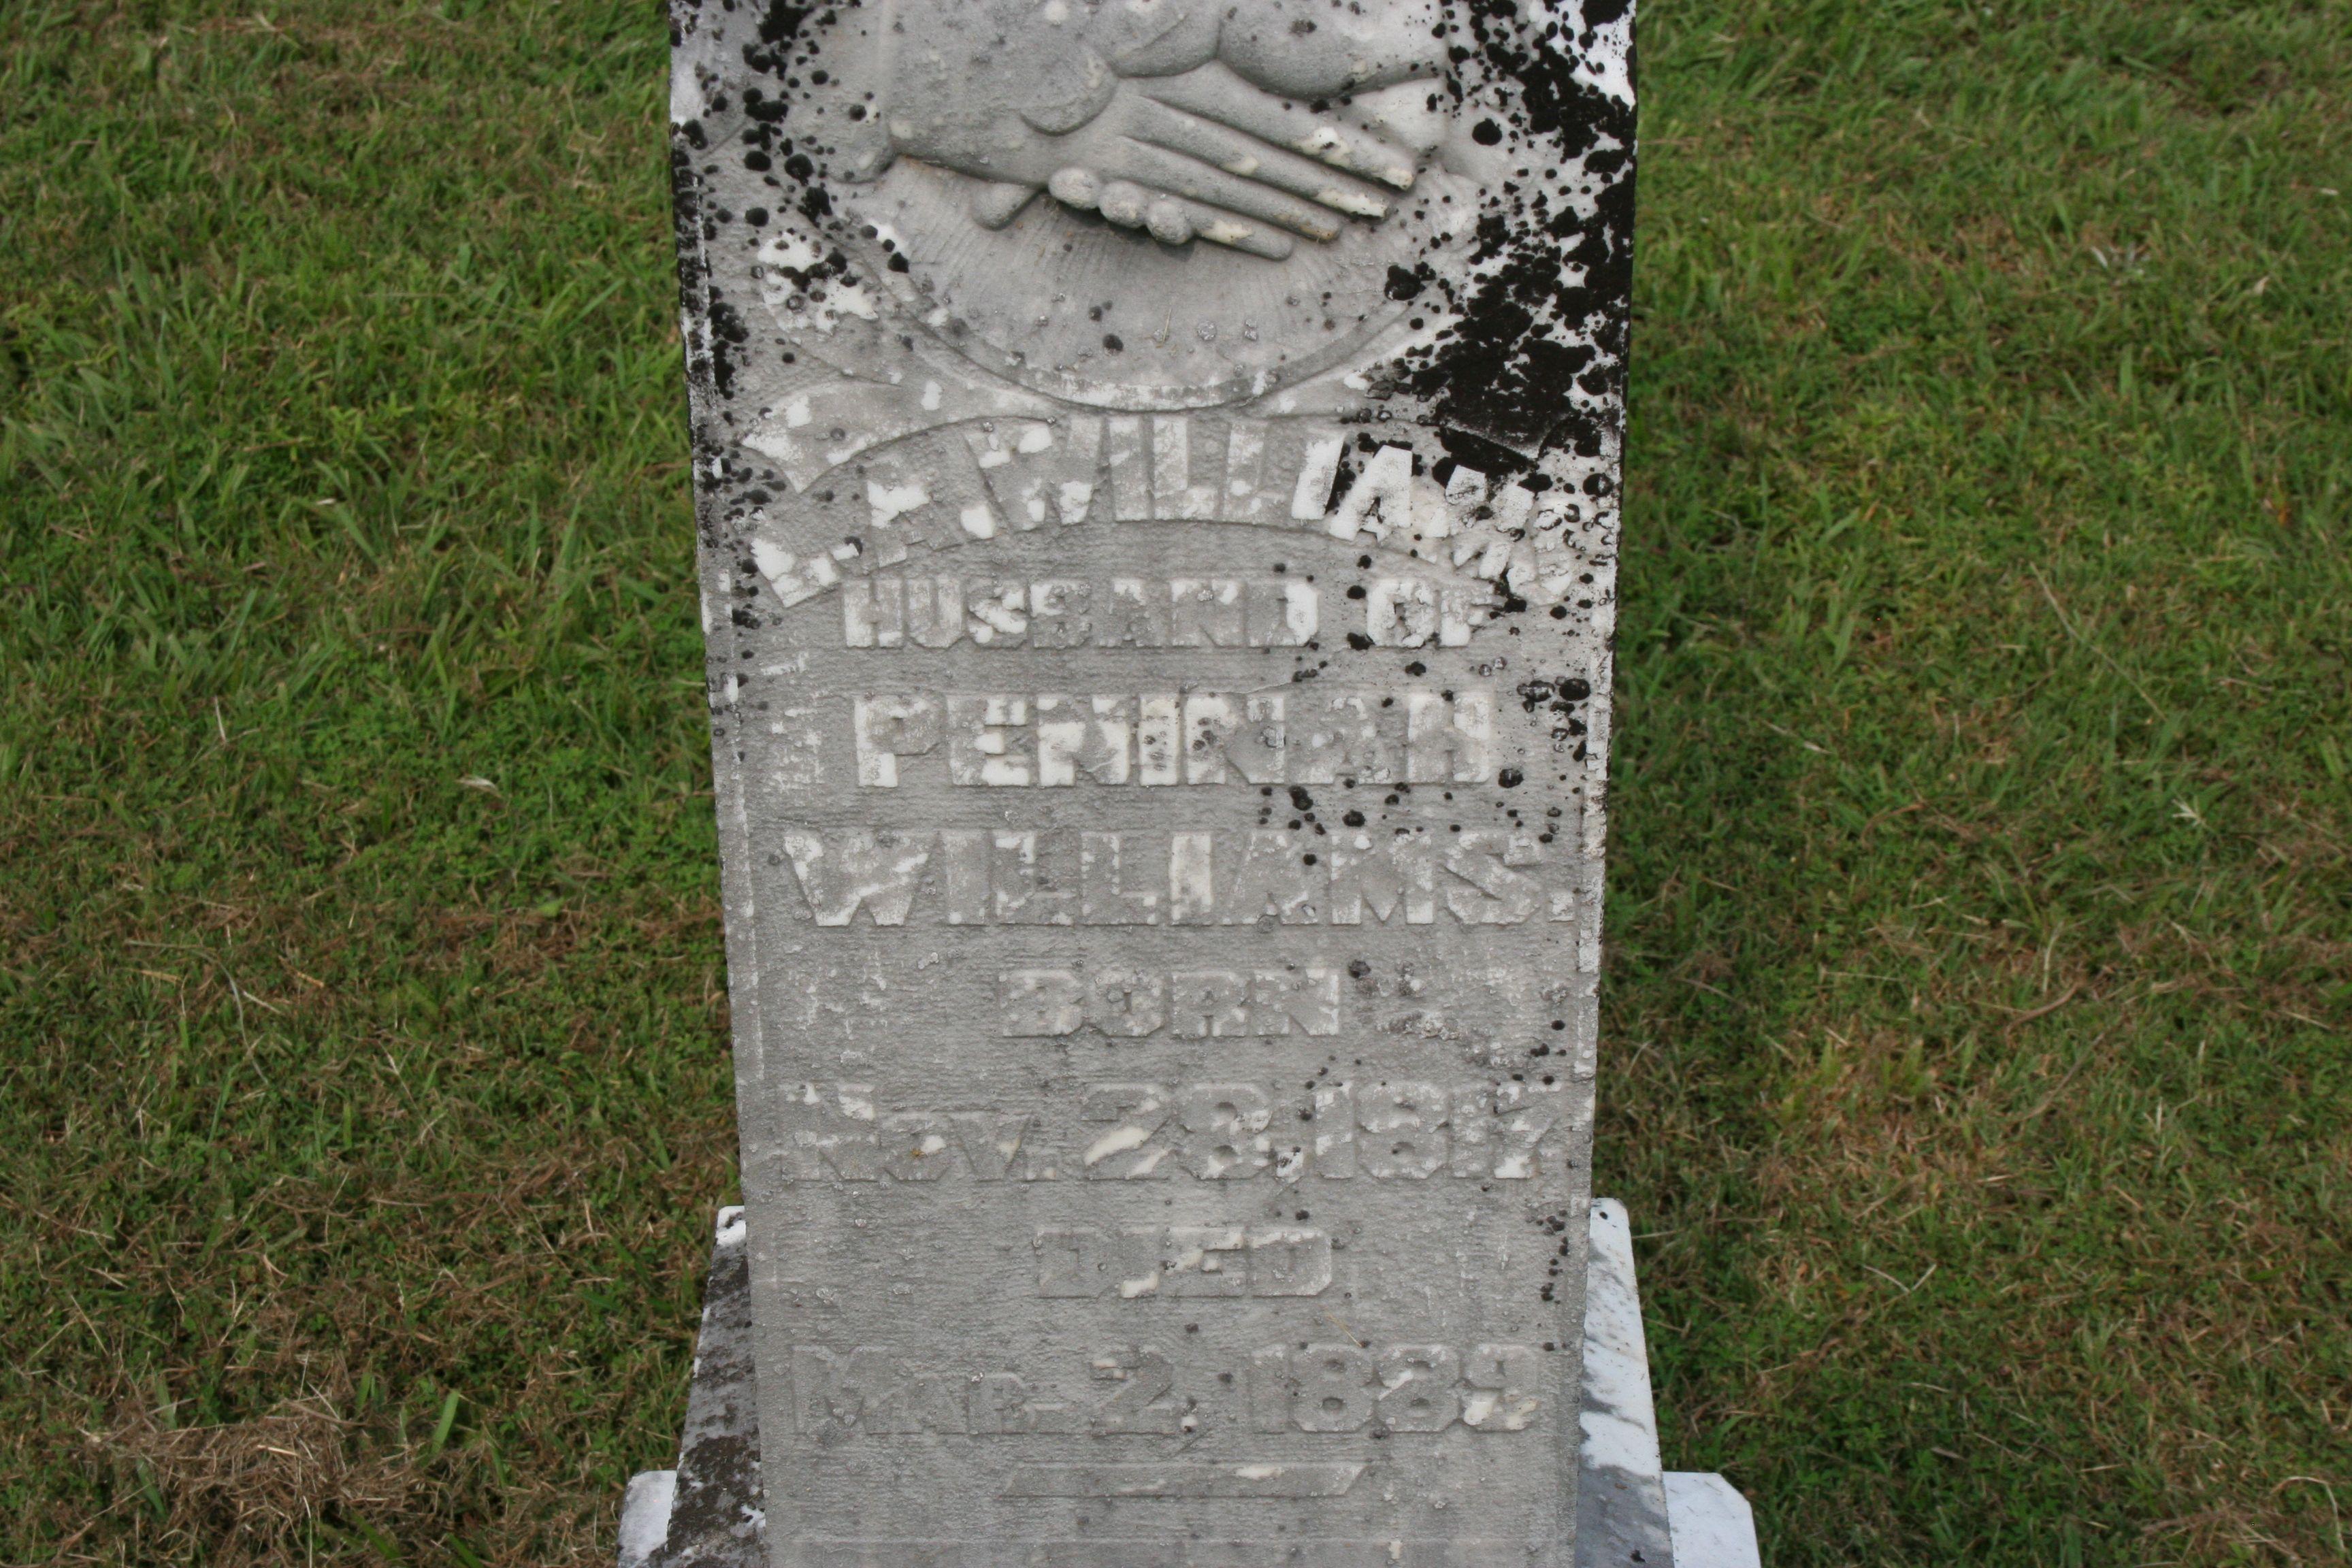 Lewis A Williams